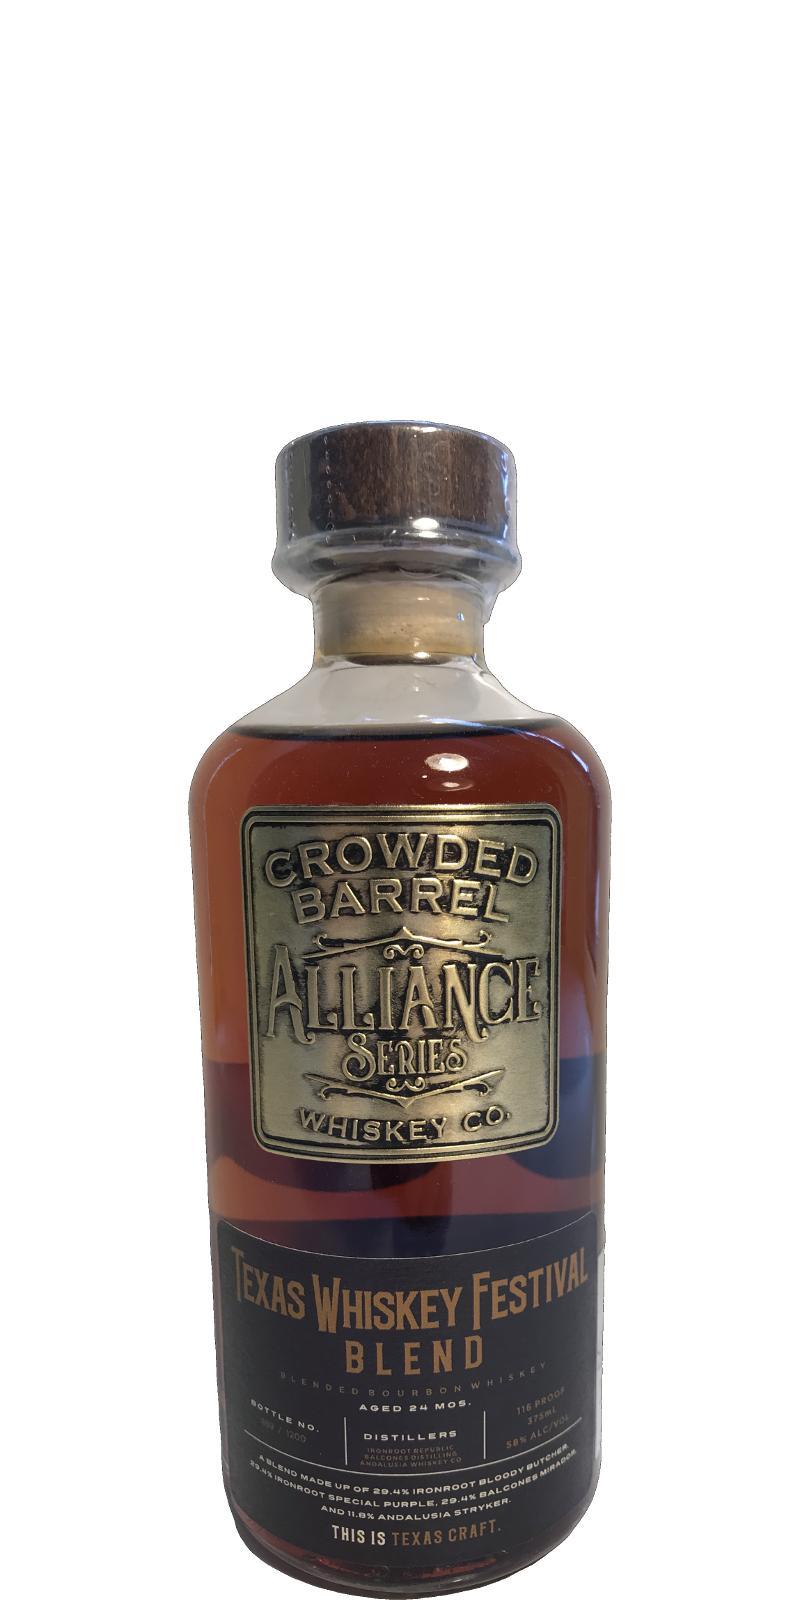 Alliance Series Texas Whiskey Festival Blend CBW